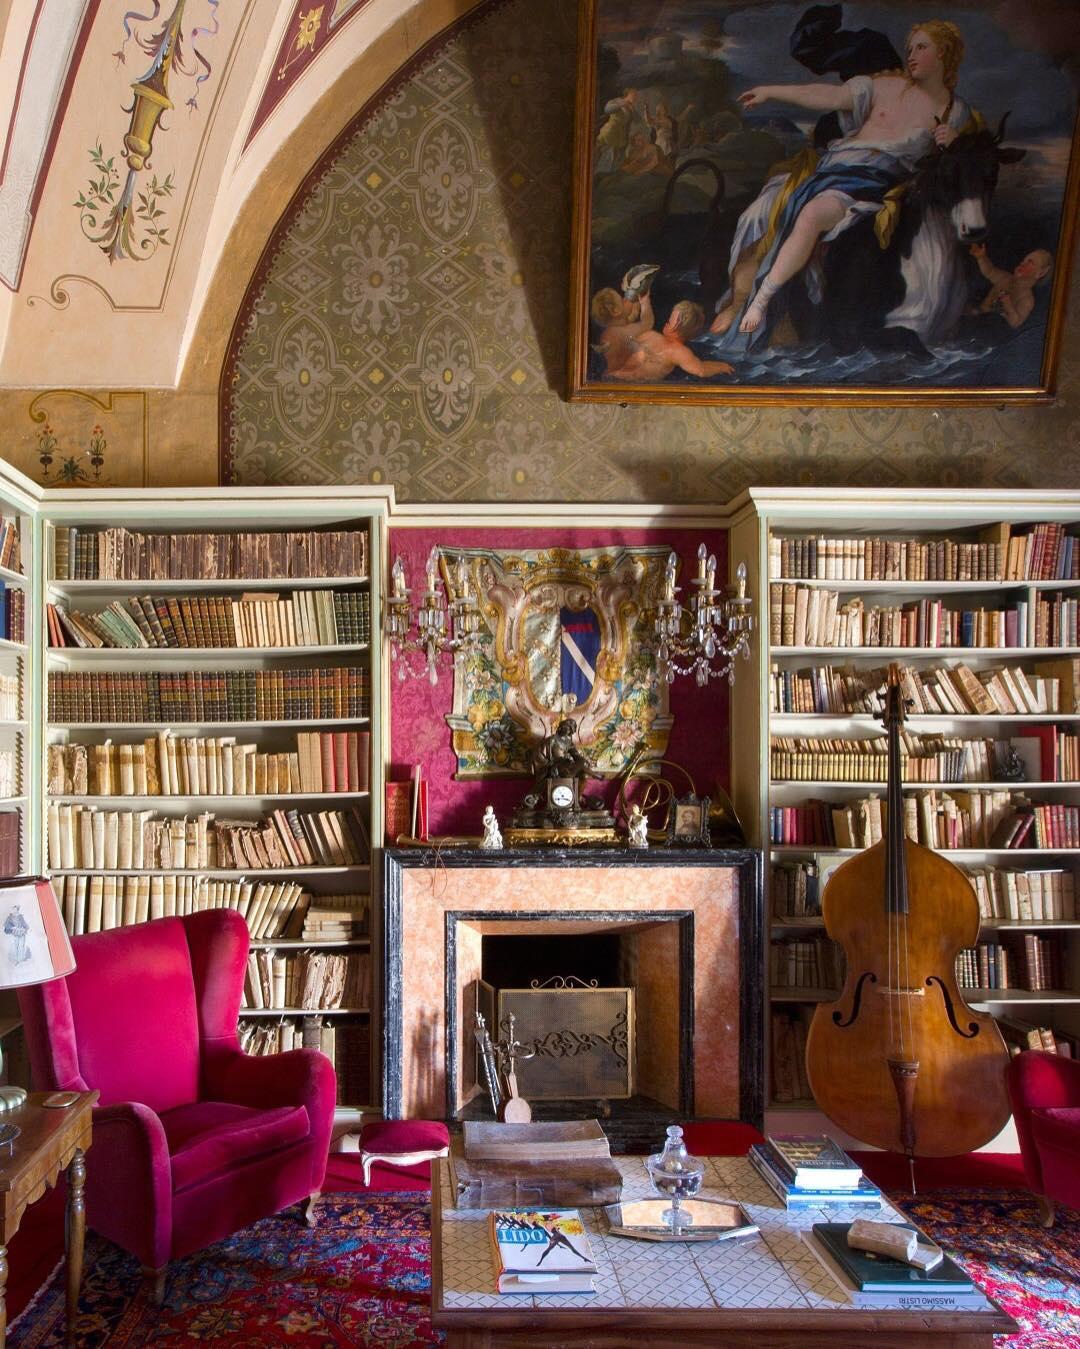 oberto gili home library bookshelves pink velvet reading chair bass fireplace renaissance art